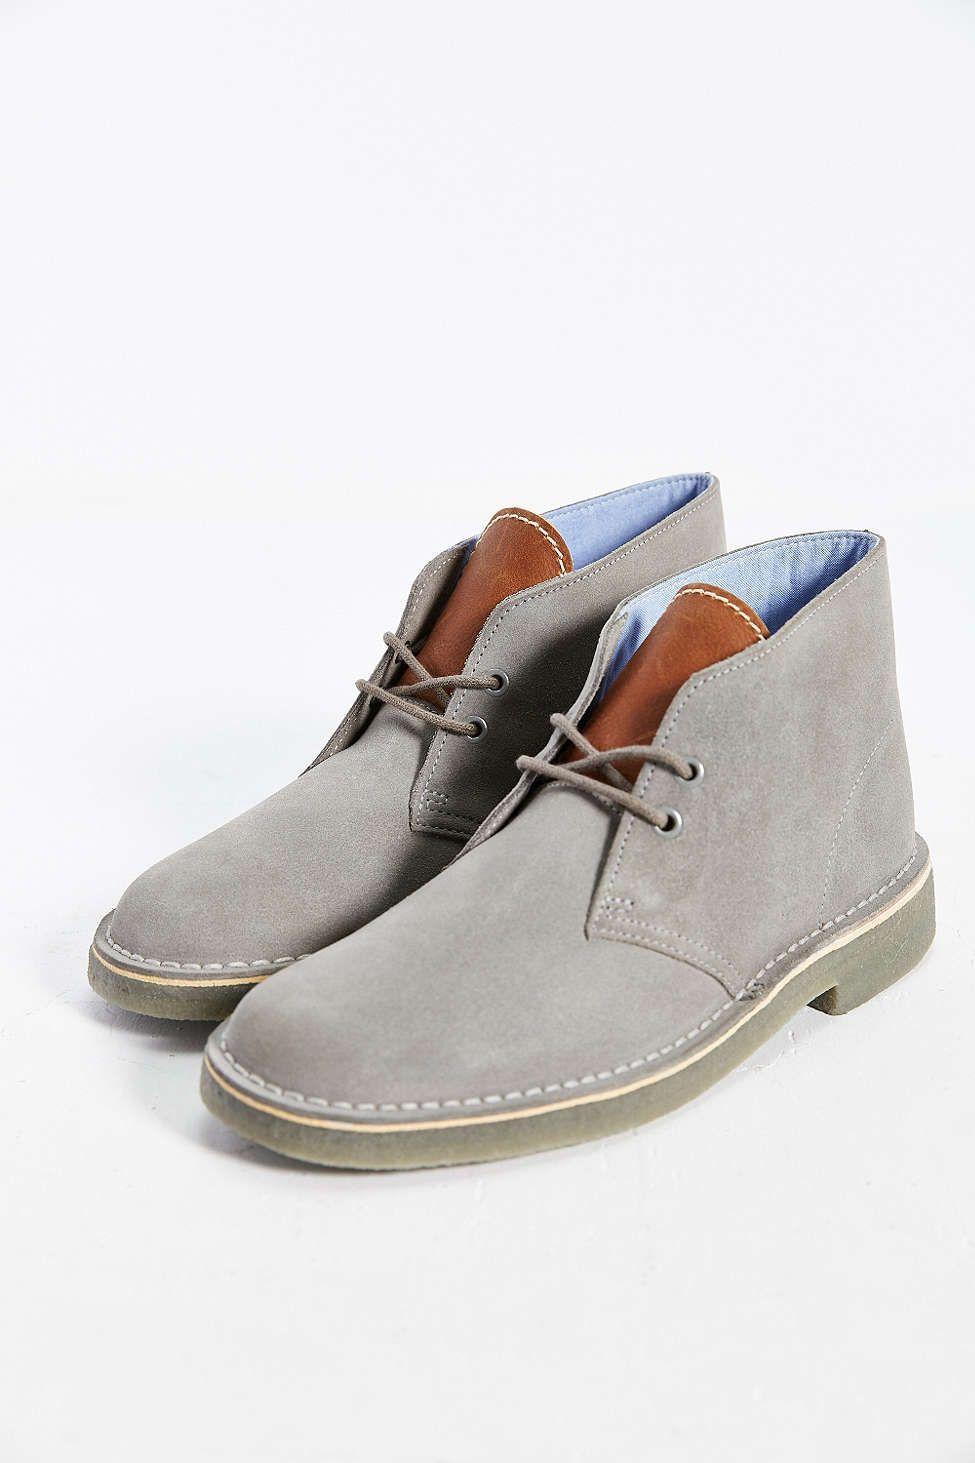 Chukka boot · Clarks X Herschel Supply Co. Suede Desert Boot